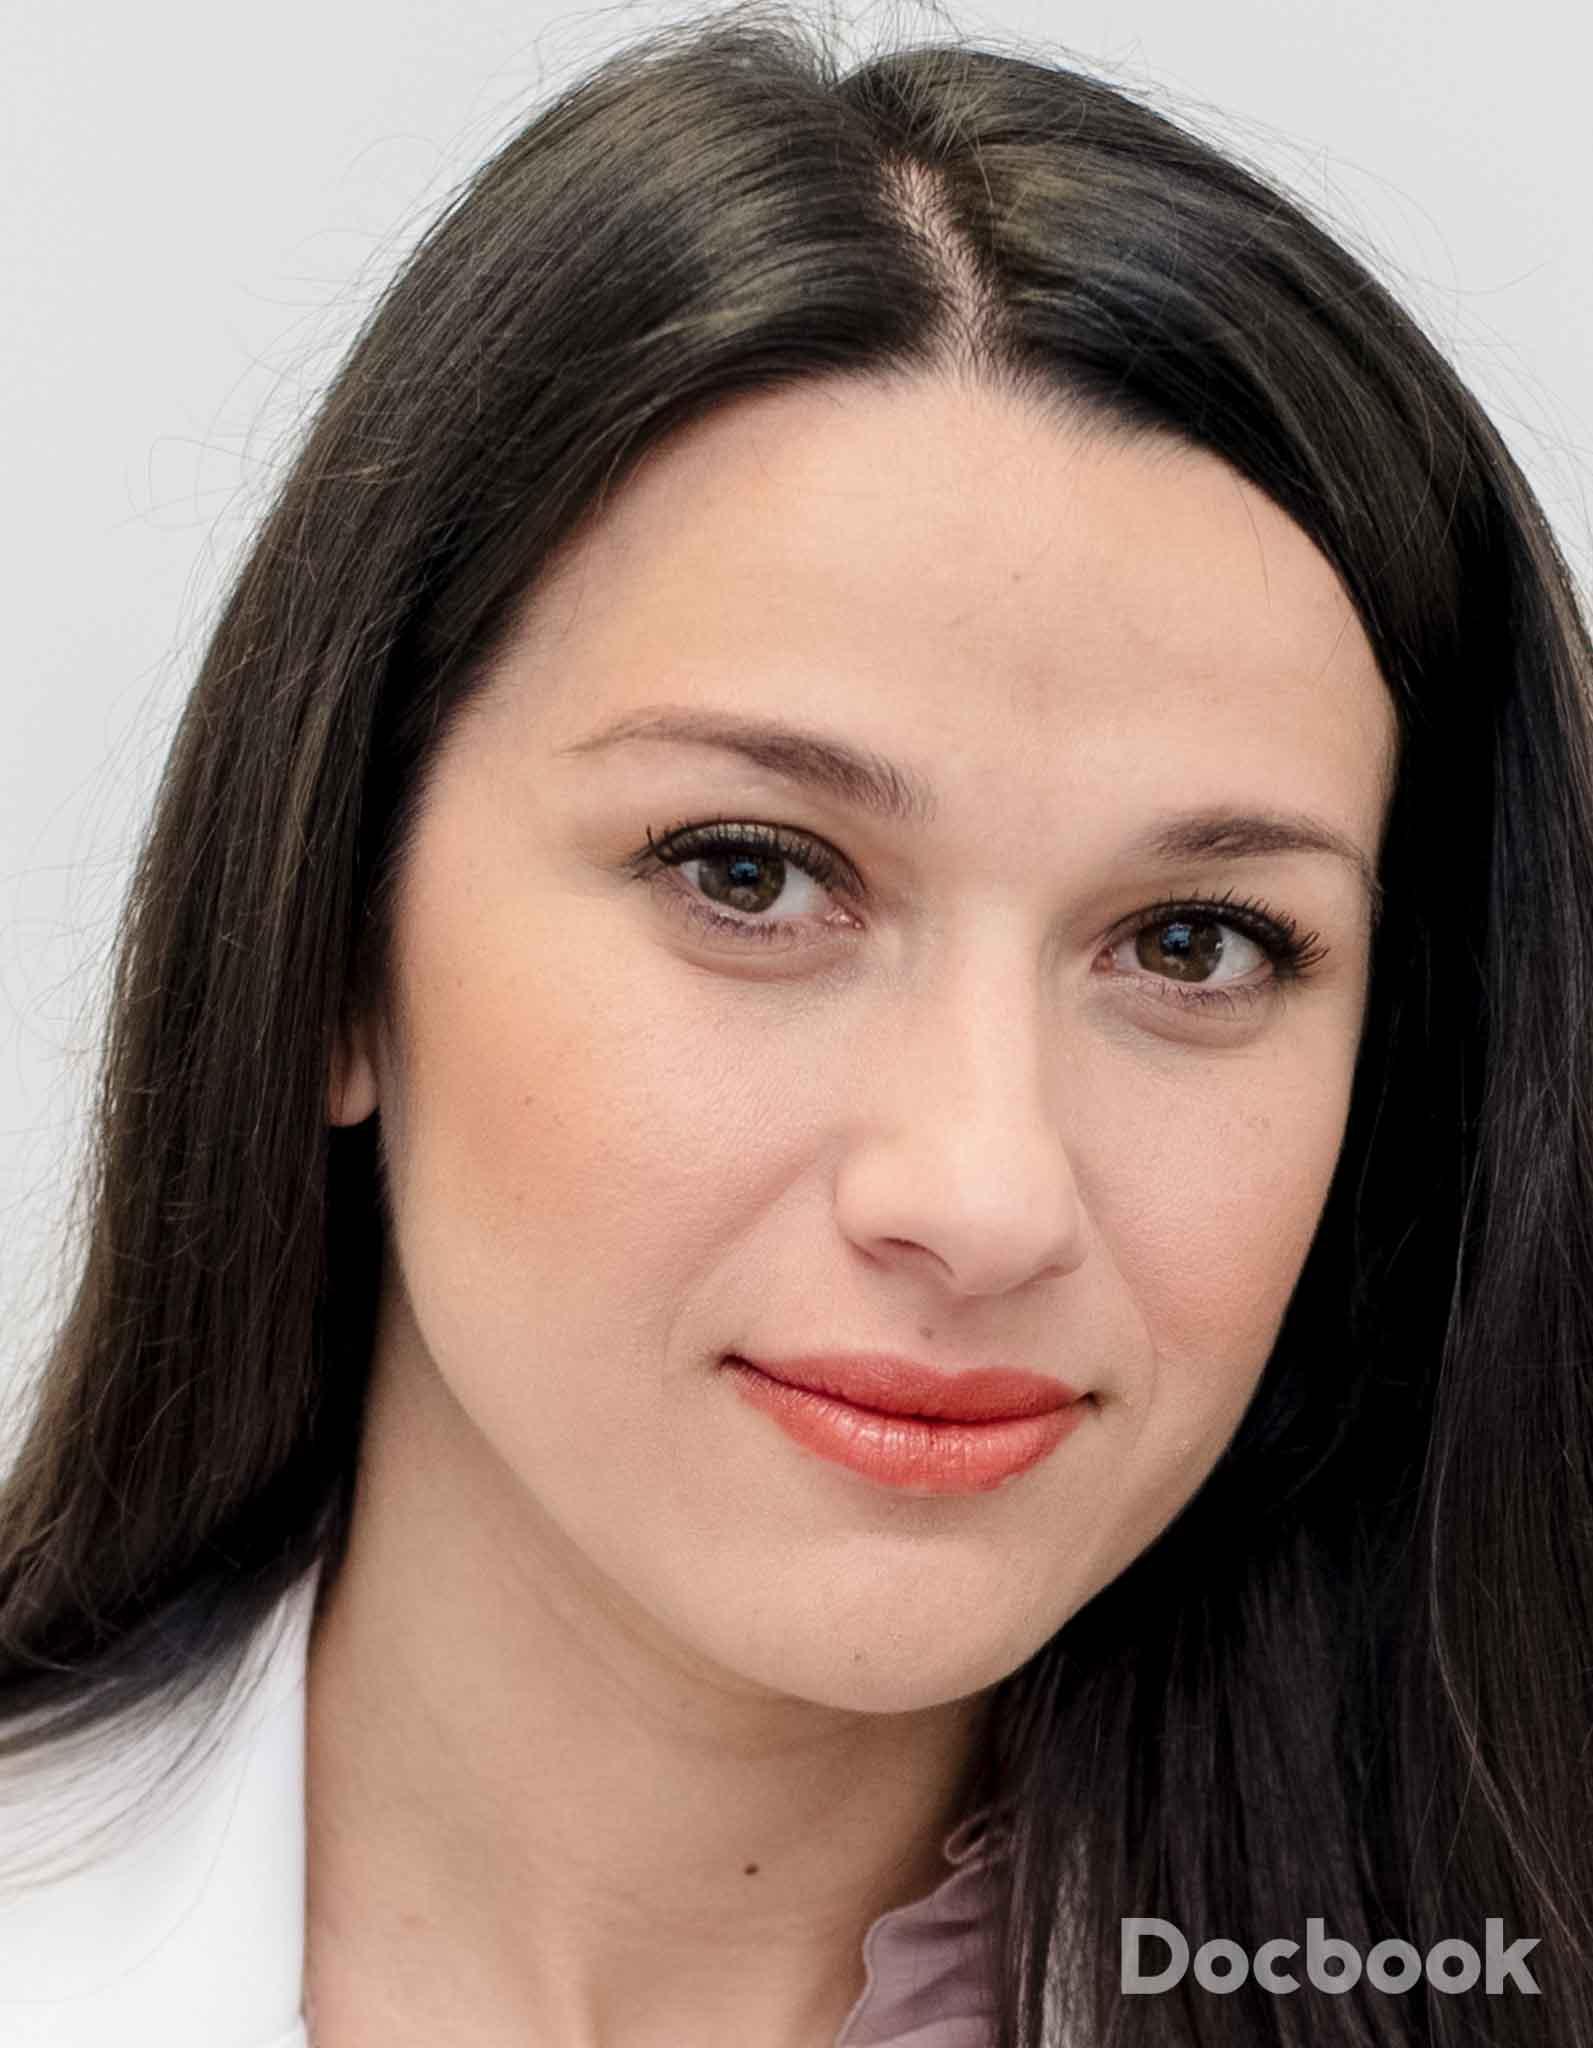 Dr. Andreea Borz